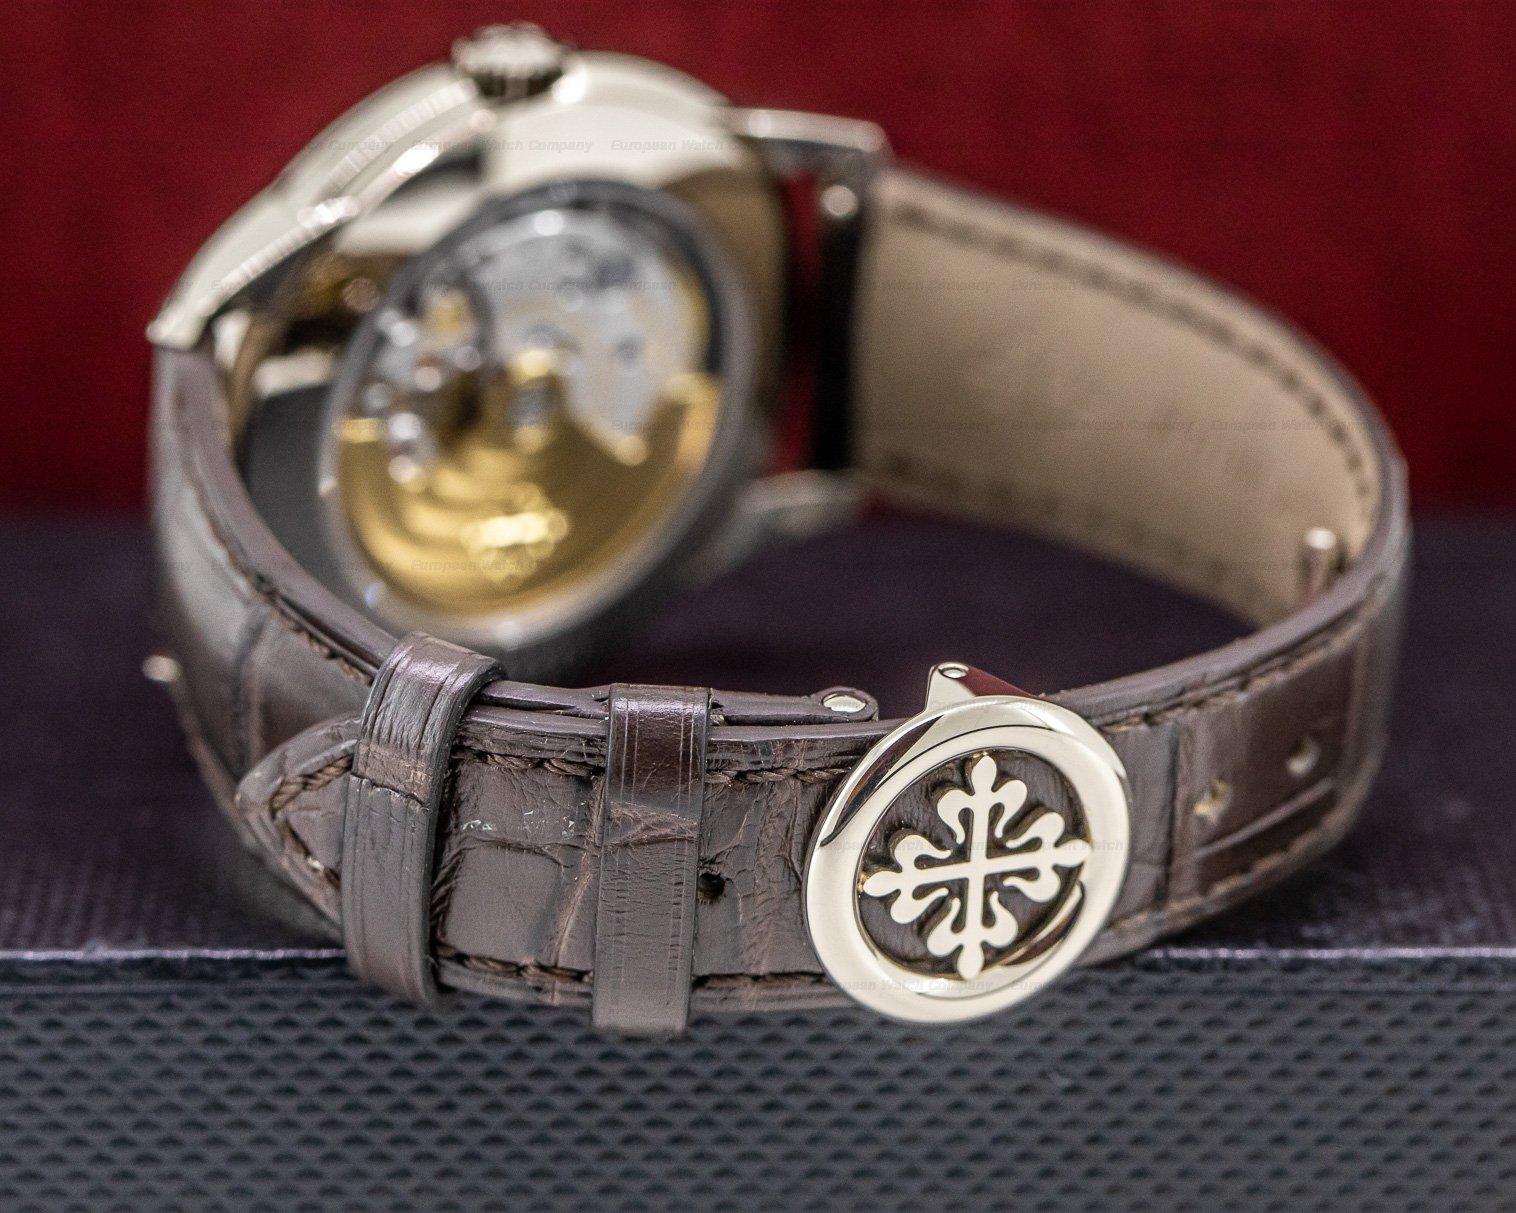 Patek Philippe 5320G-001 Perpetual Calendar Grand Complication 18K White Gold